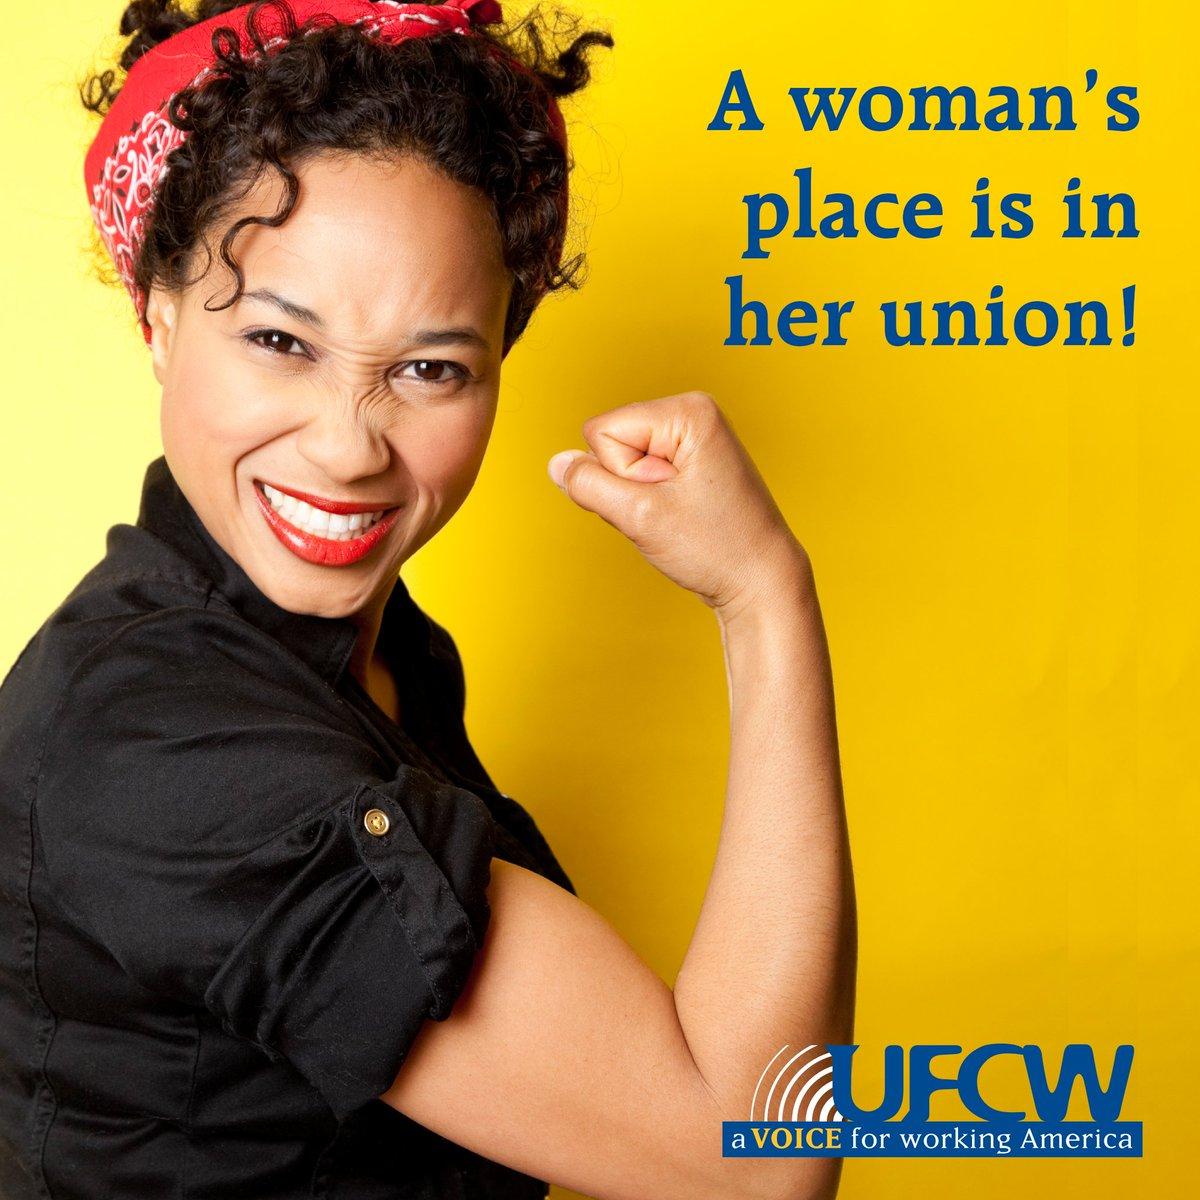 Women in unions r closer to closing gender pay gap than non-union wrkrs: https://t.co/sOTZmlYfXl #WomensHistoryMonth https://t.co/ROmH6jvqiU